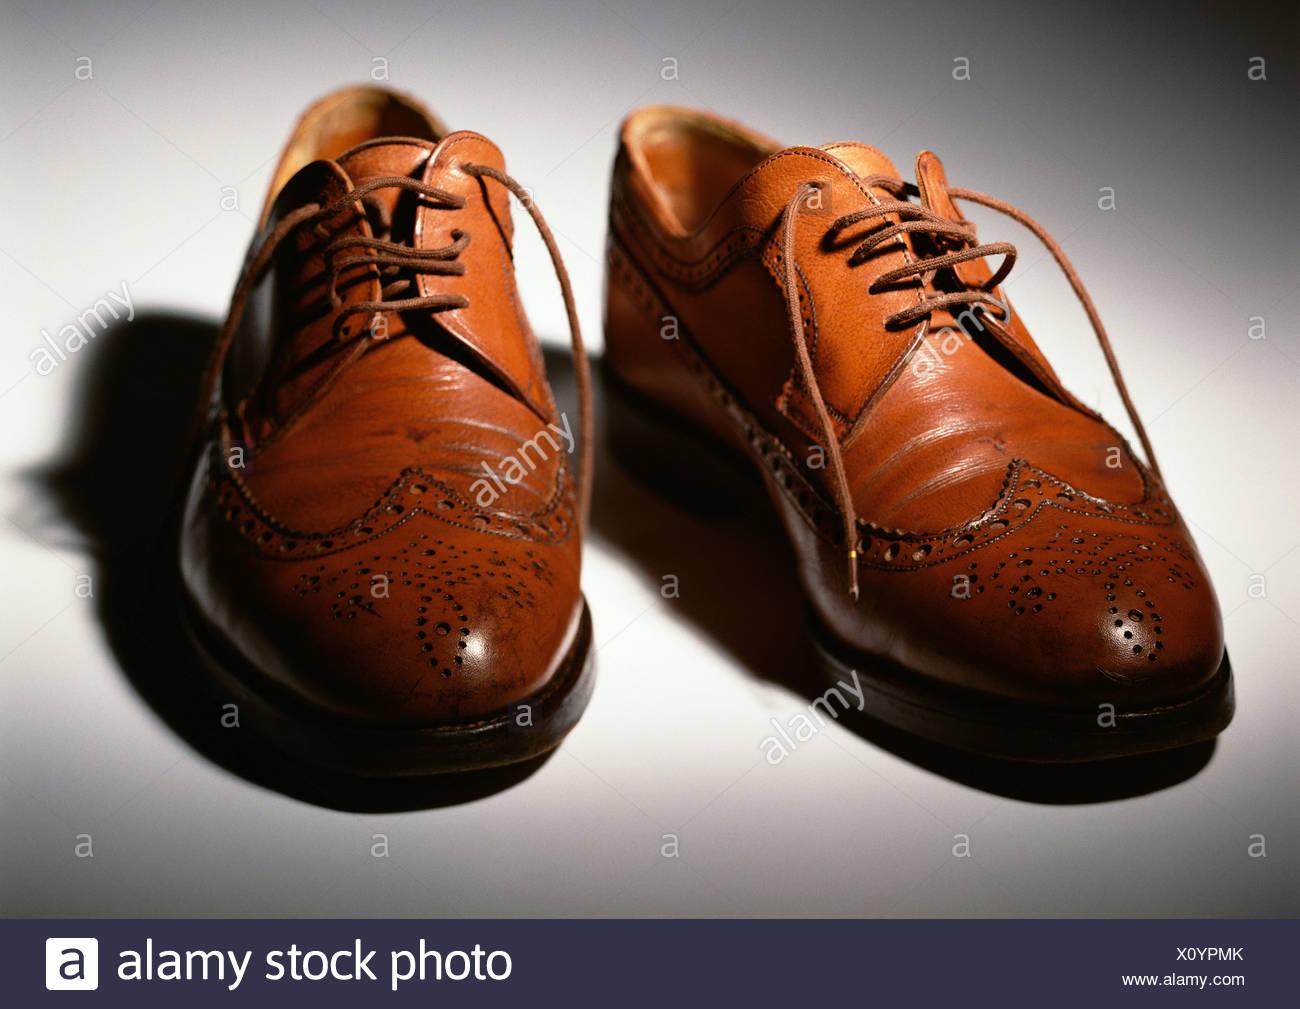 9833465a Men's dress shoes Stock Photo: 275976419 - Alamy